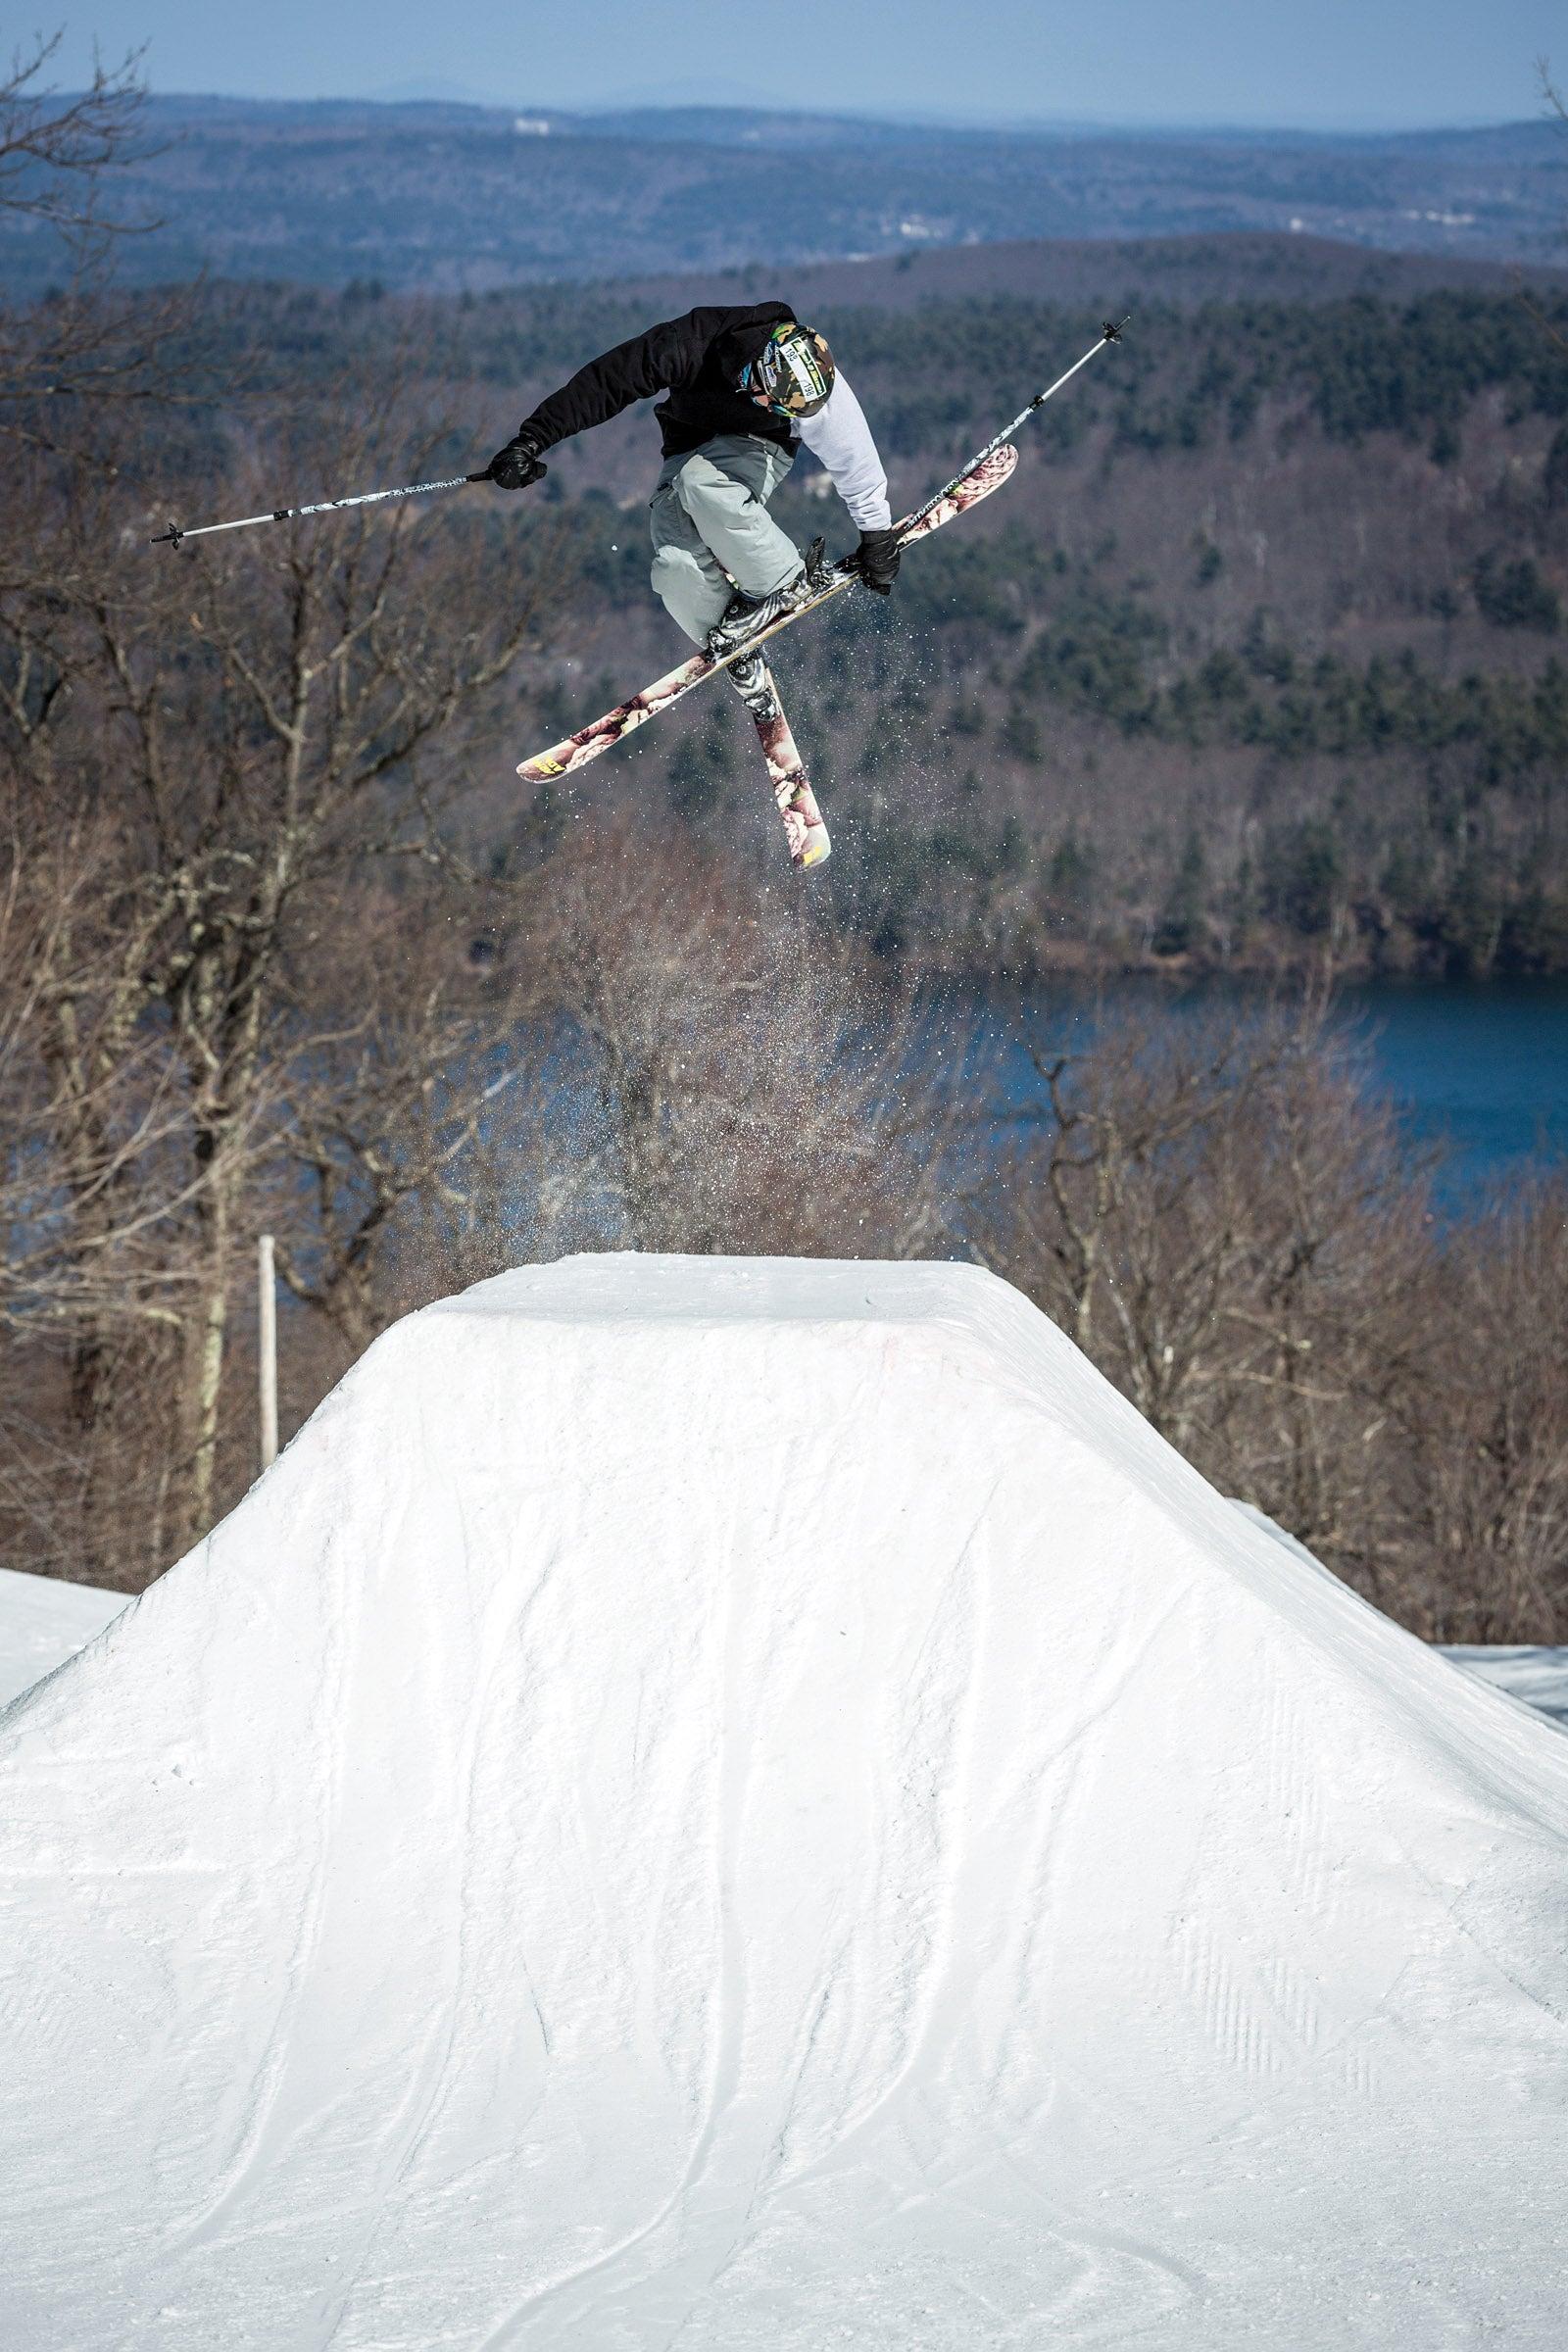 Skier in air with crossed skis